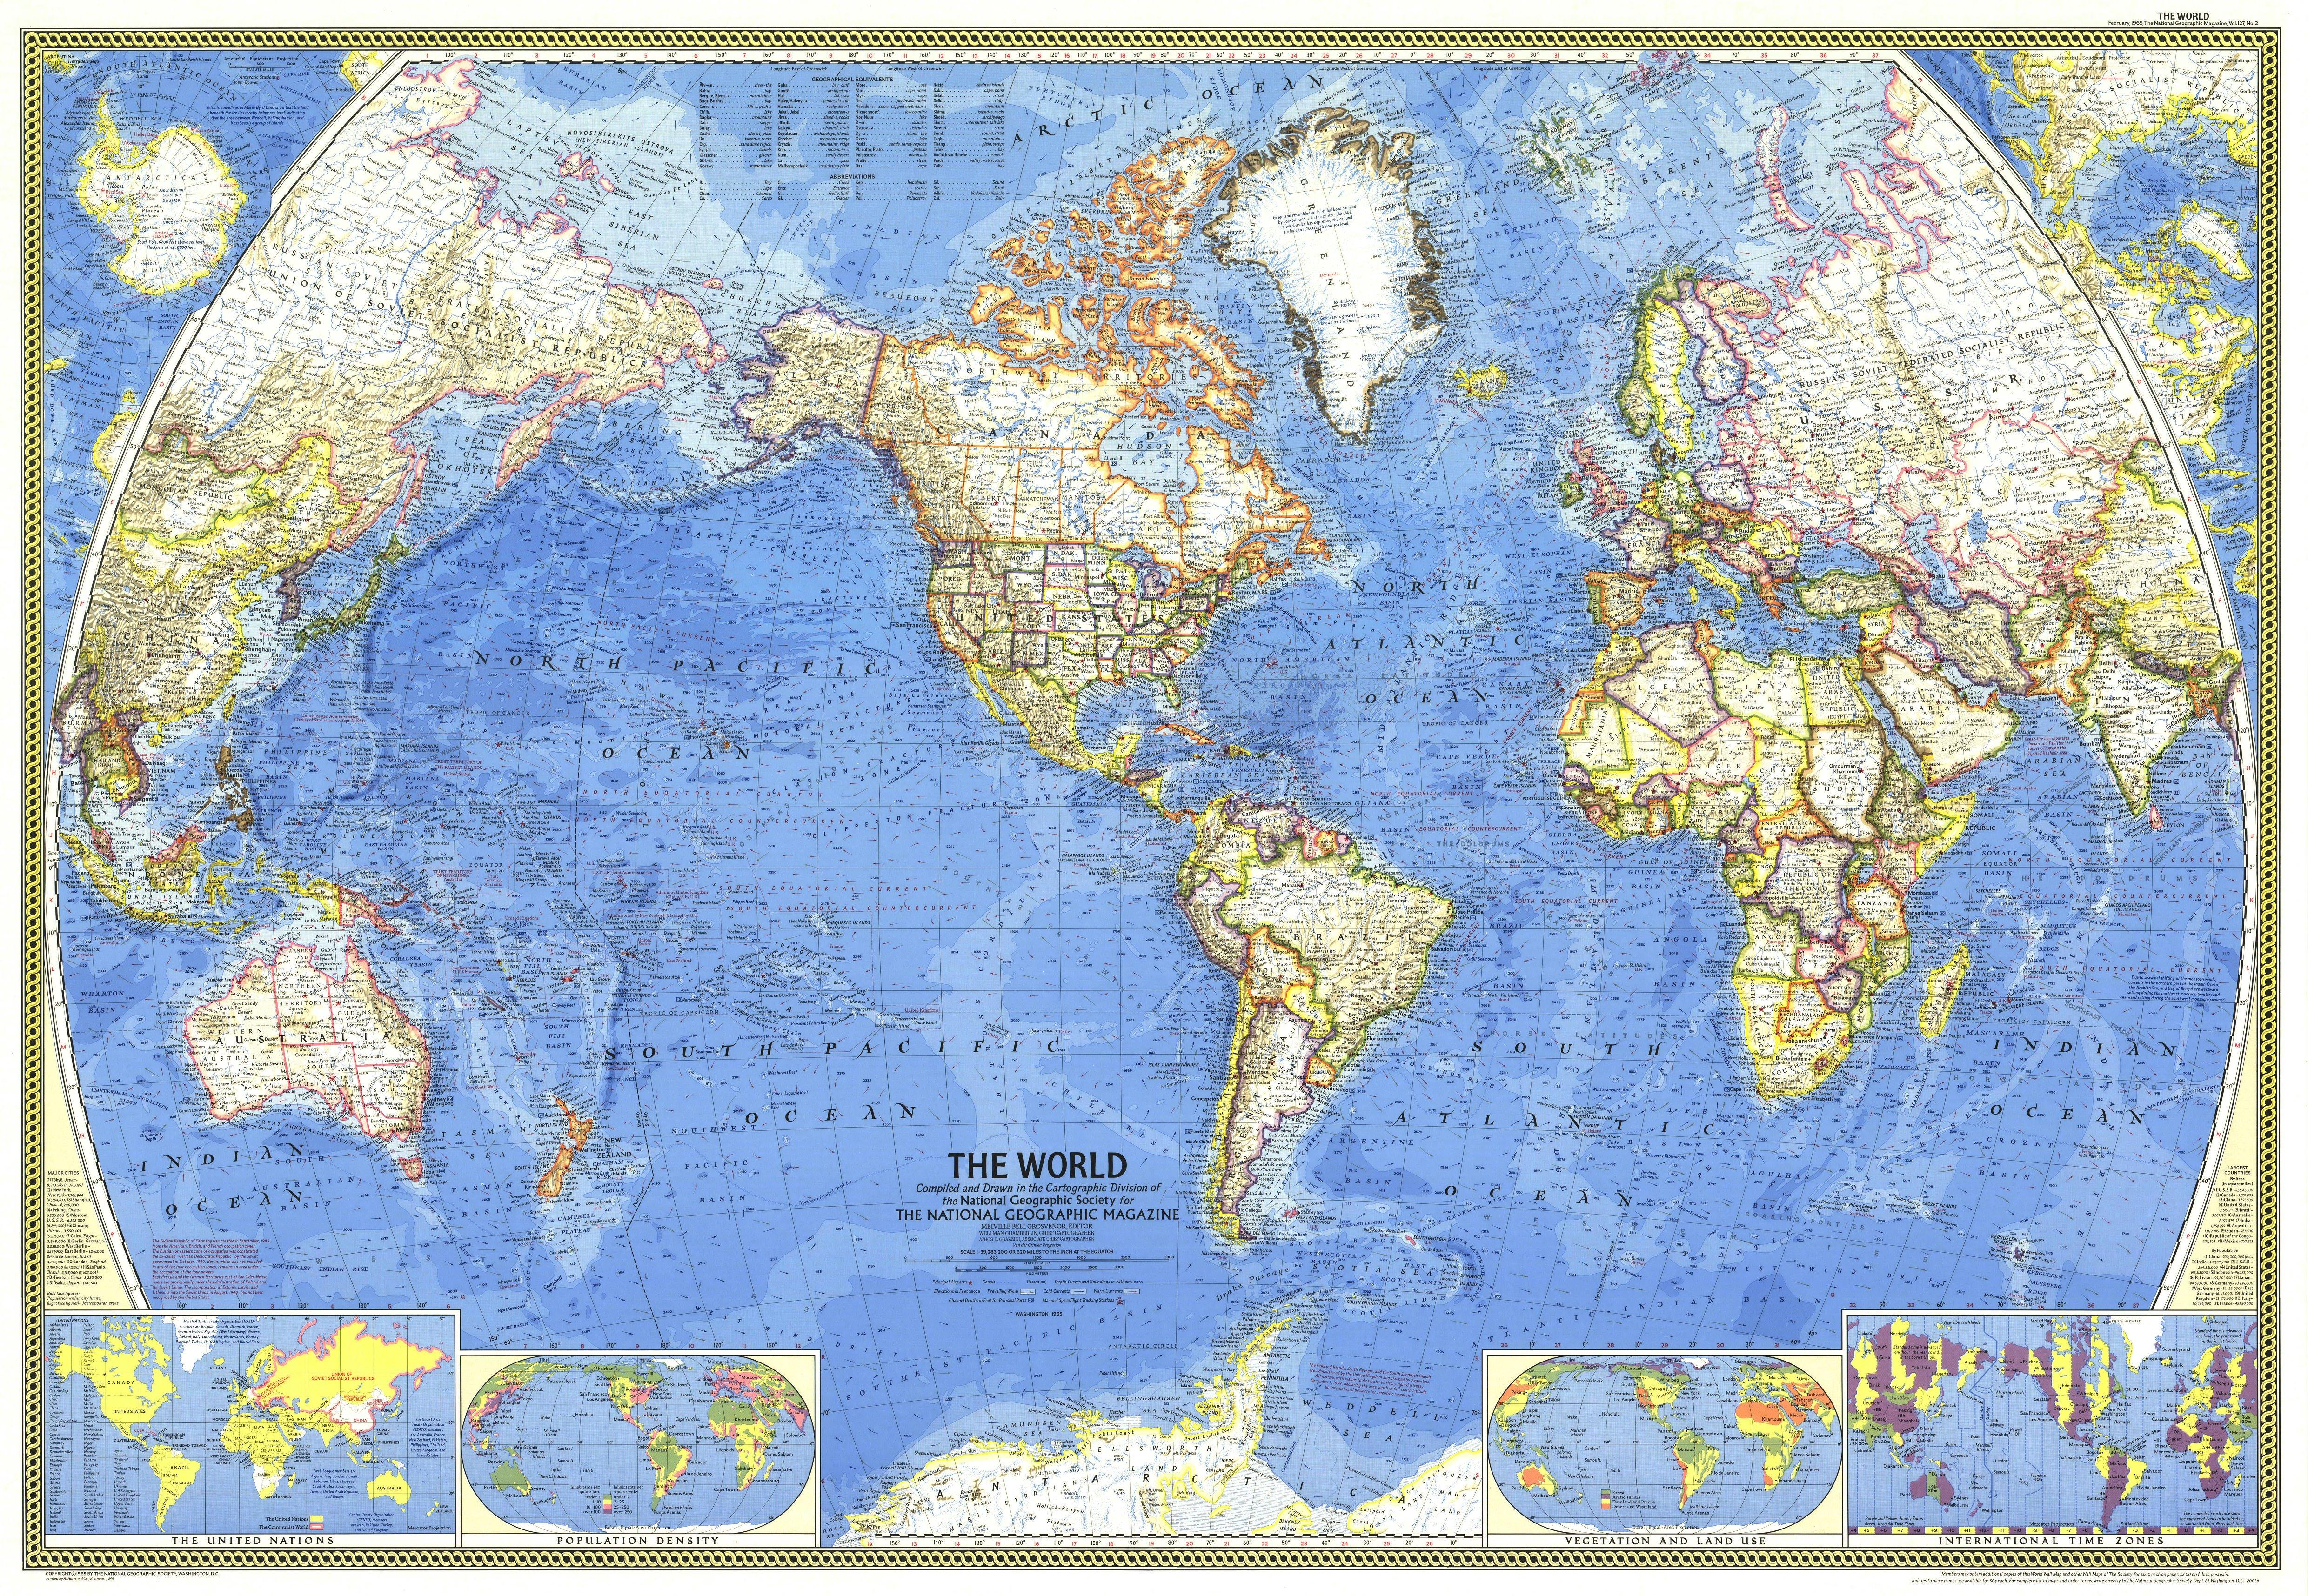 World map wallpaper high resolution wallpapersafari world map 1965 high resolution hd wallpaper general 1144799 4961x3431 gumiabroncs Choice Image